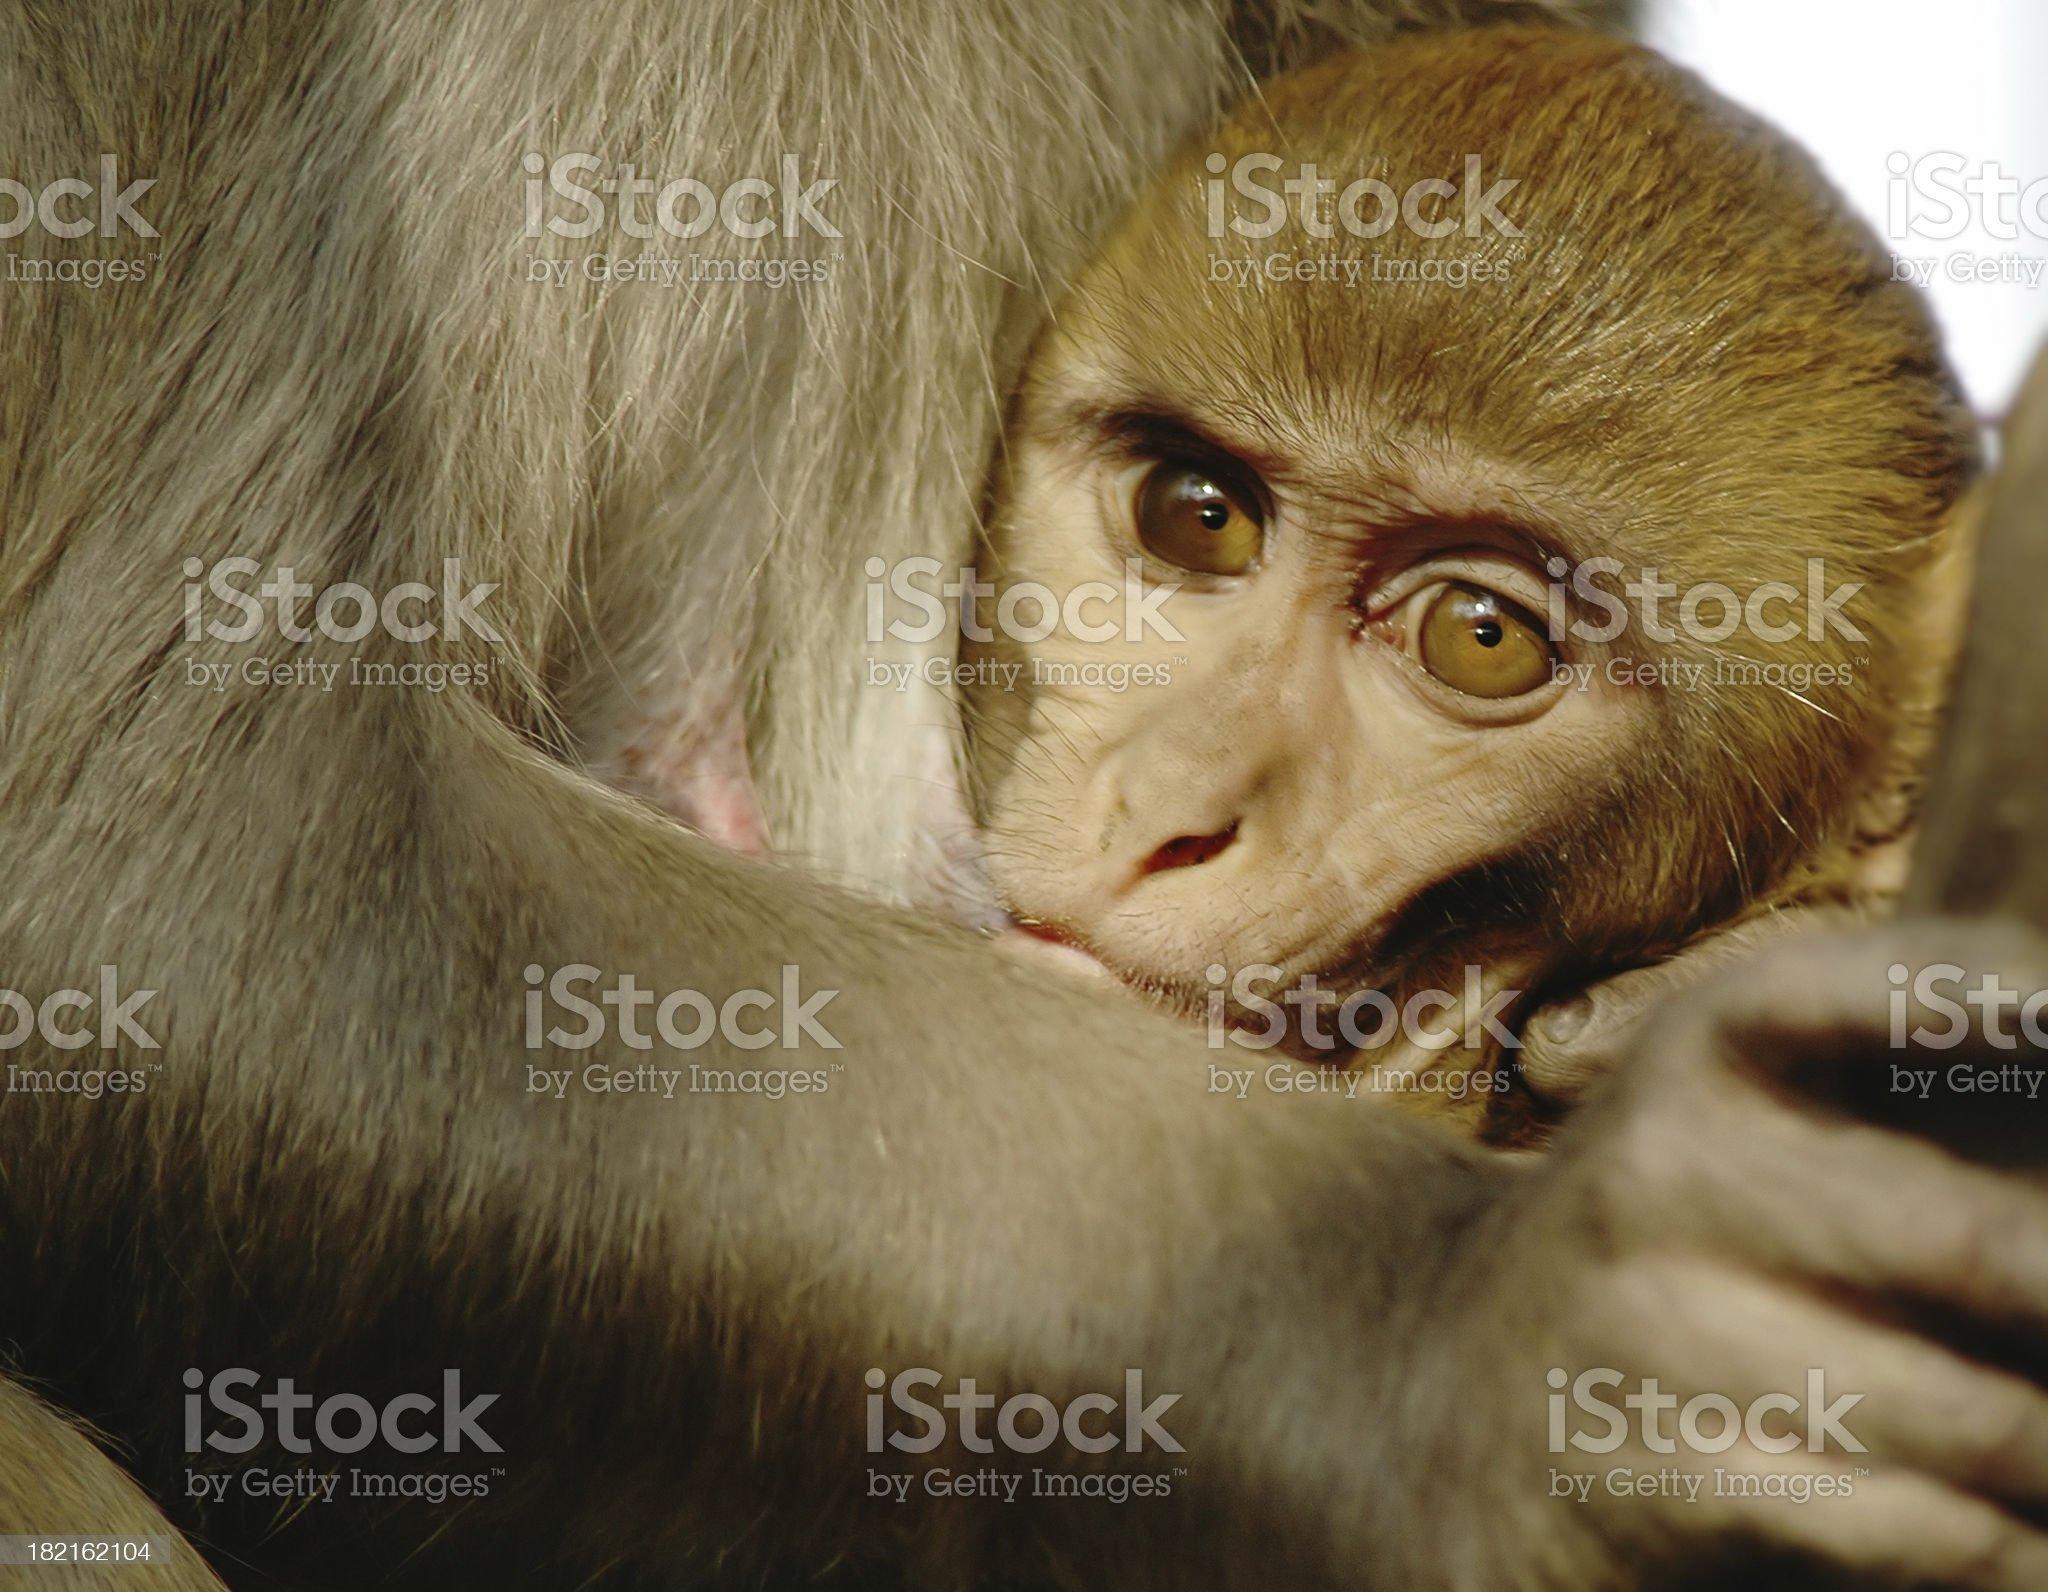 Baby Monkey royalty-free stock photo